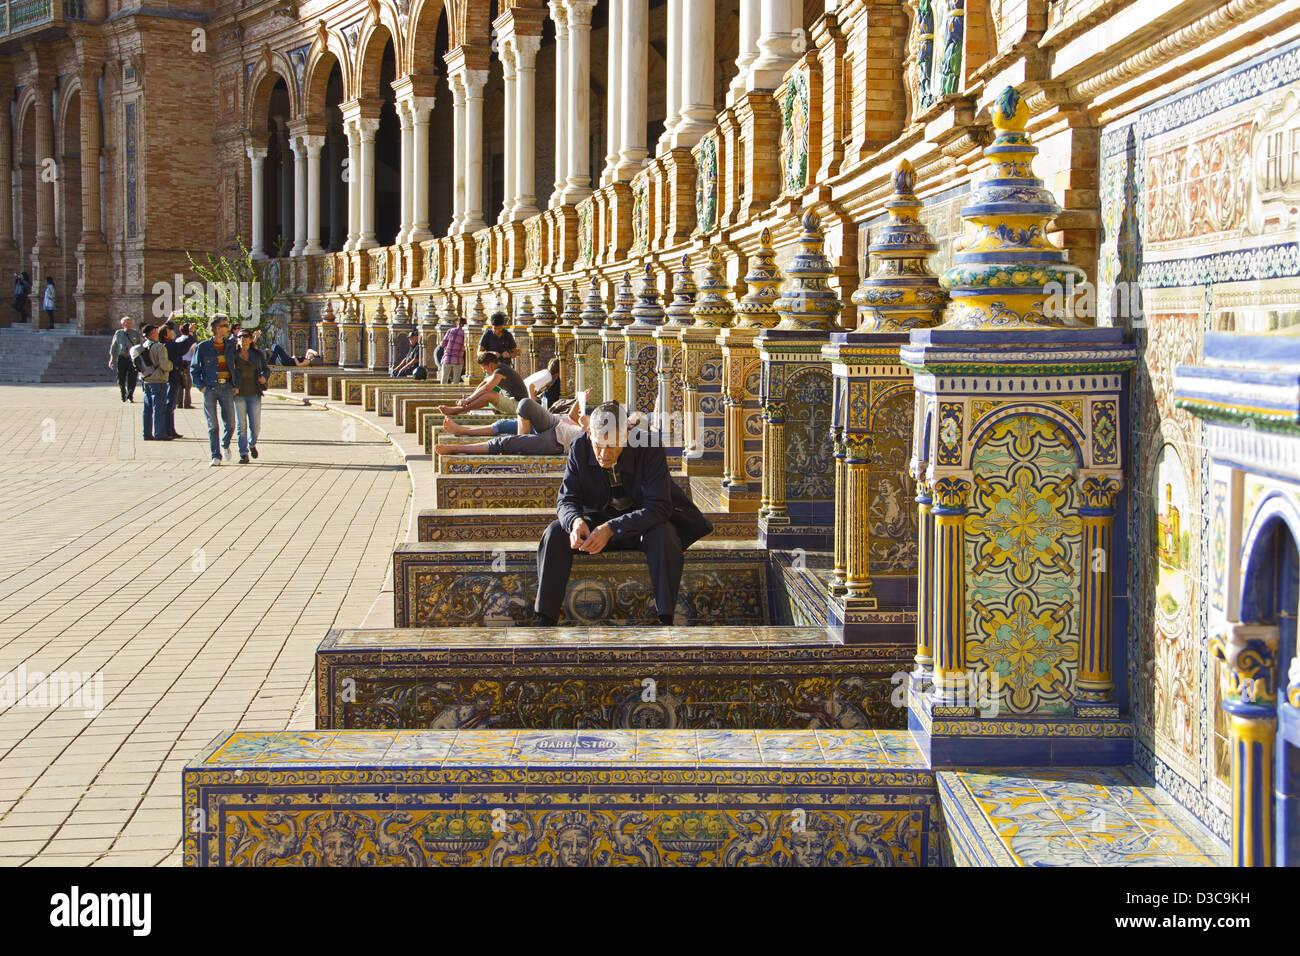 Plaza de Espana, Sevilla, Spain, Seville, Andalusia - Stock Image